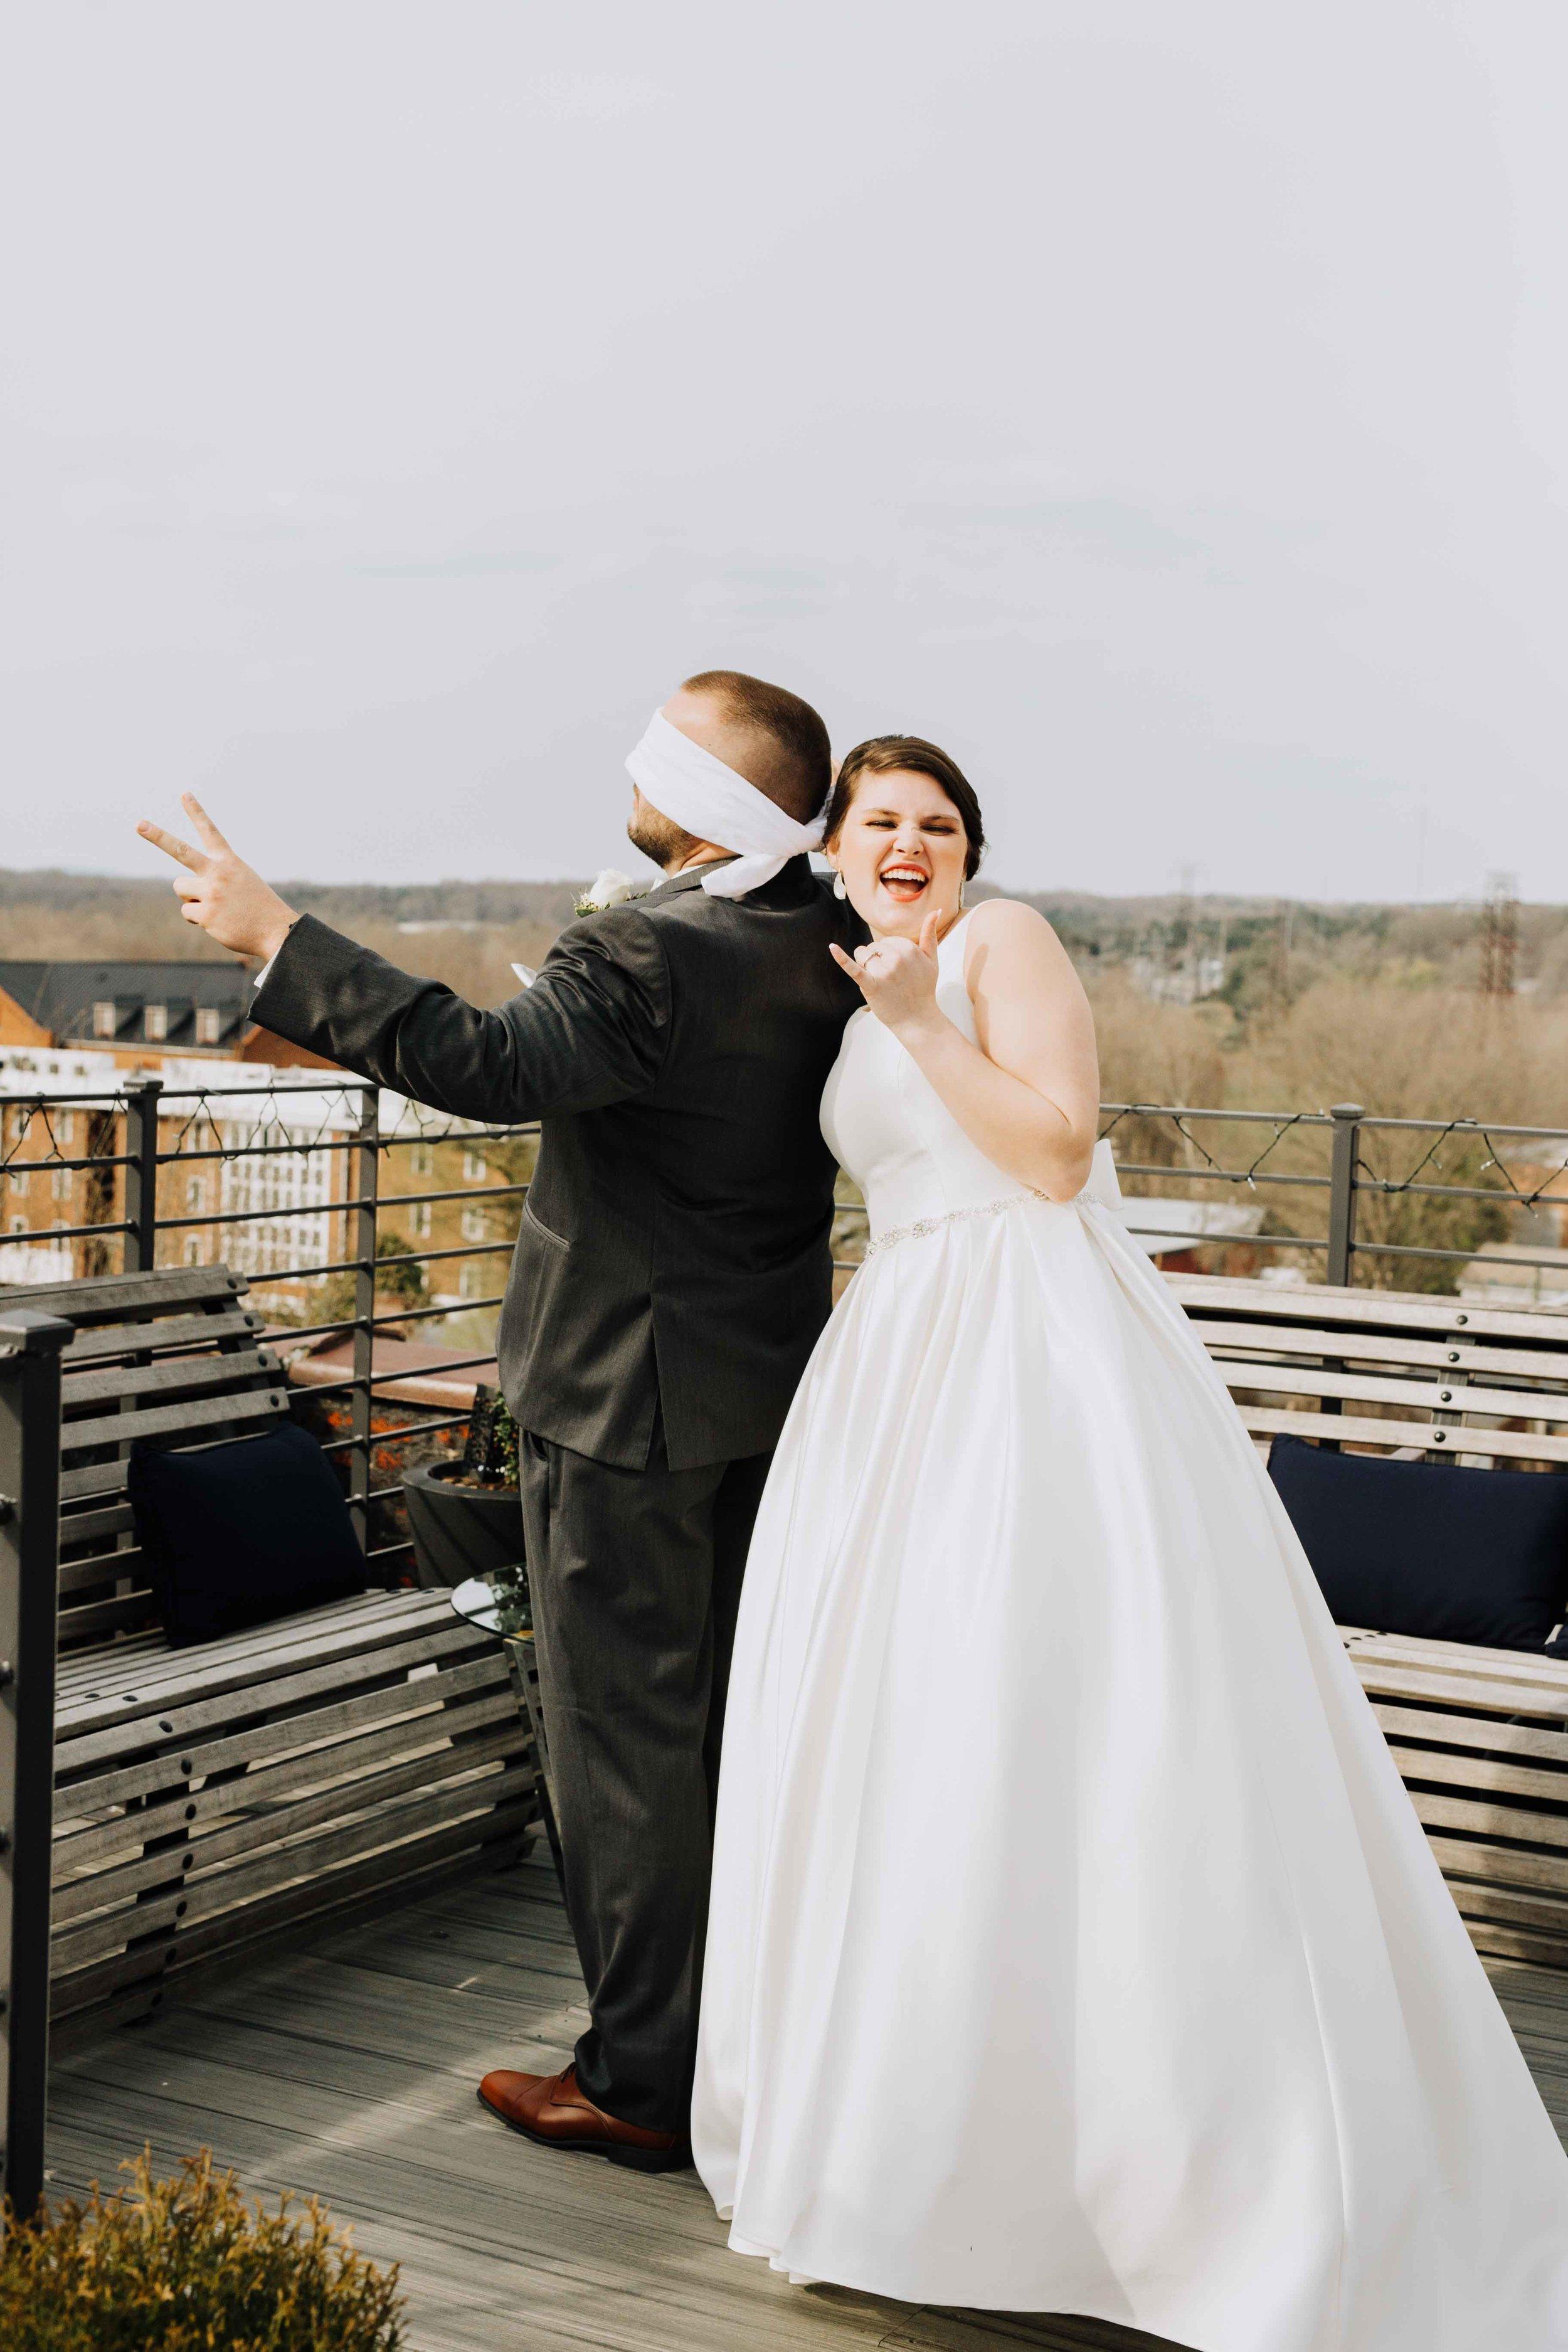 Farmville-Virginia-Wedding-Hotel-Weynoke-Downtown-Jacqueline-Waters-Photography-Detailed- (591).jpg